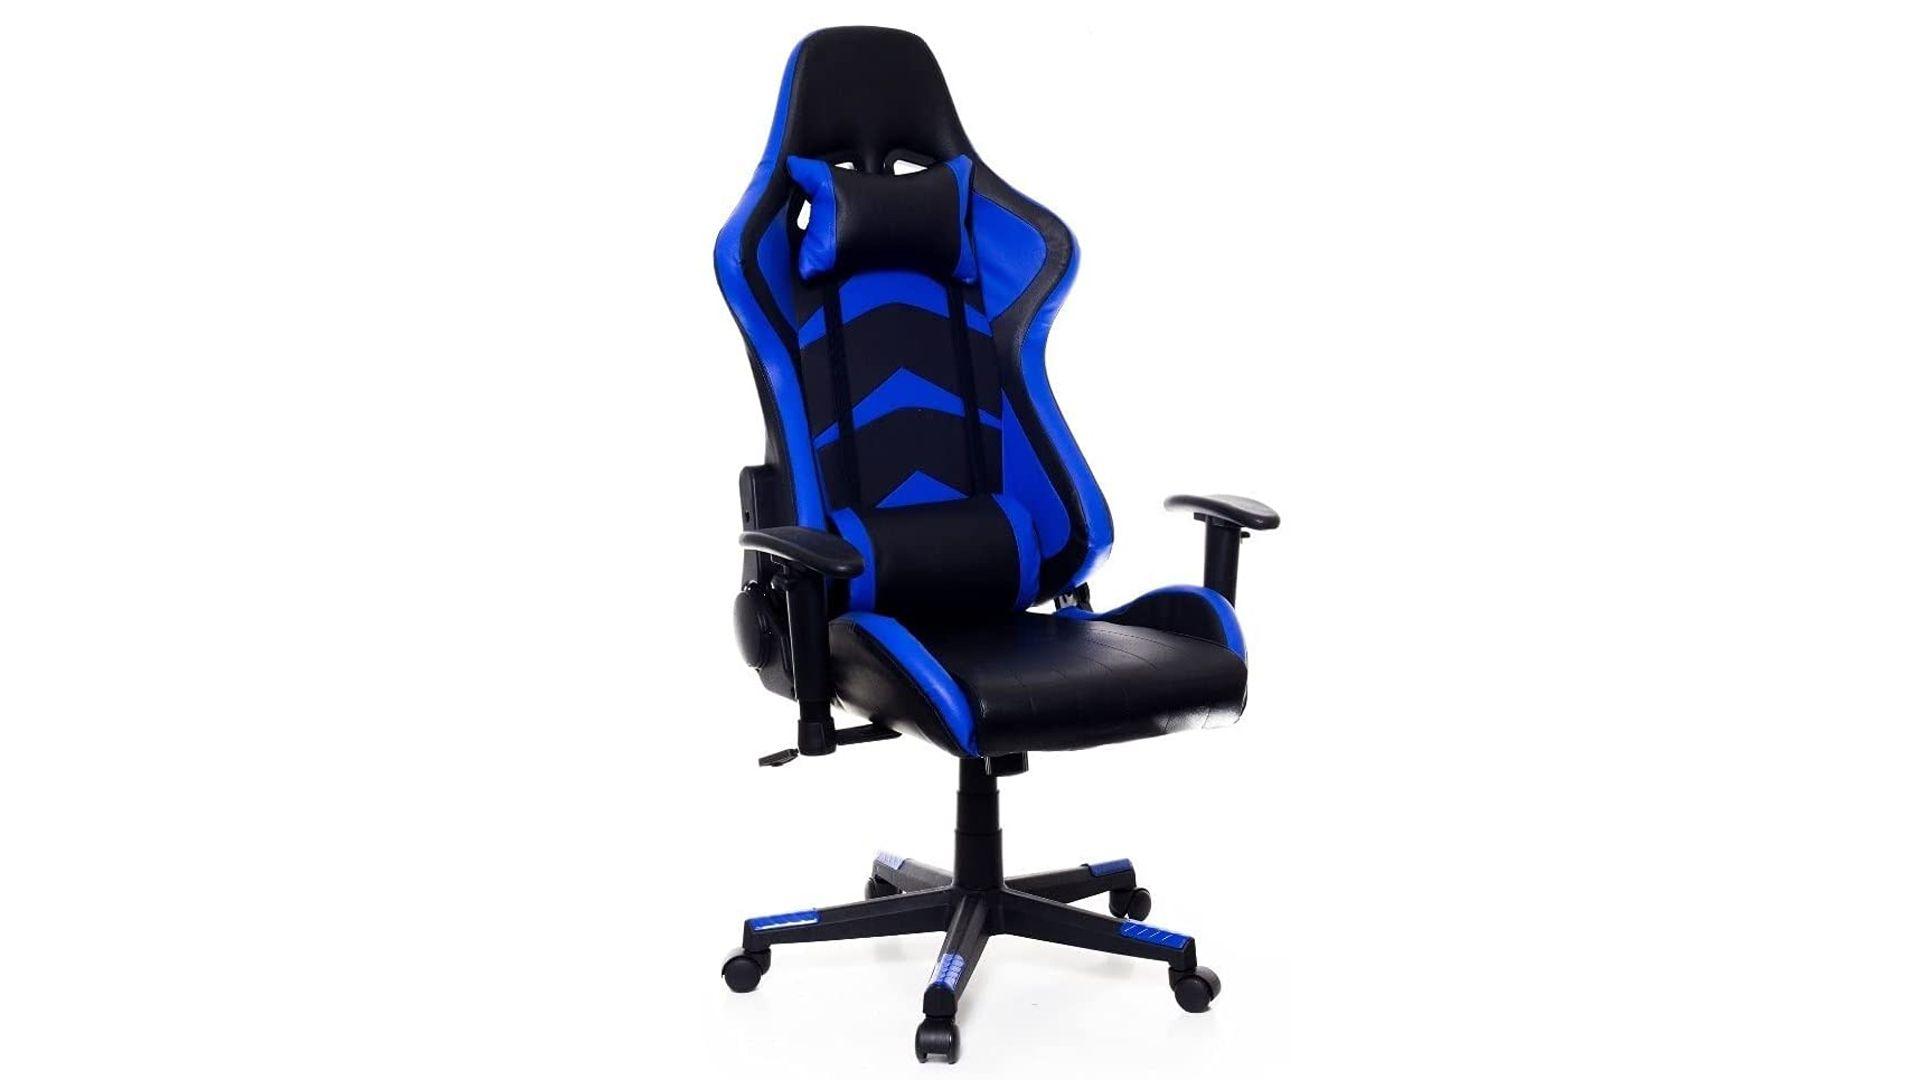 Destaque da cadeira gamer azul e preta Warrior Prizi